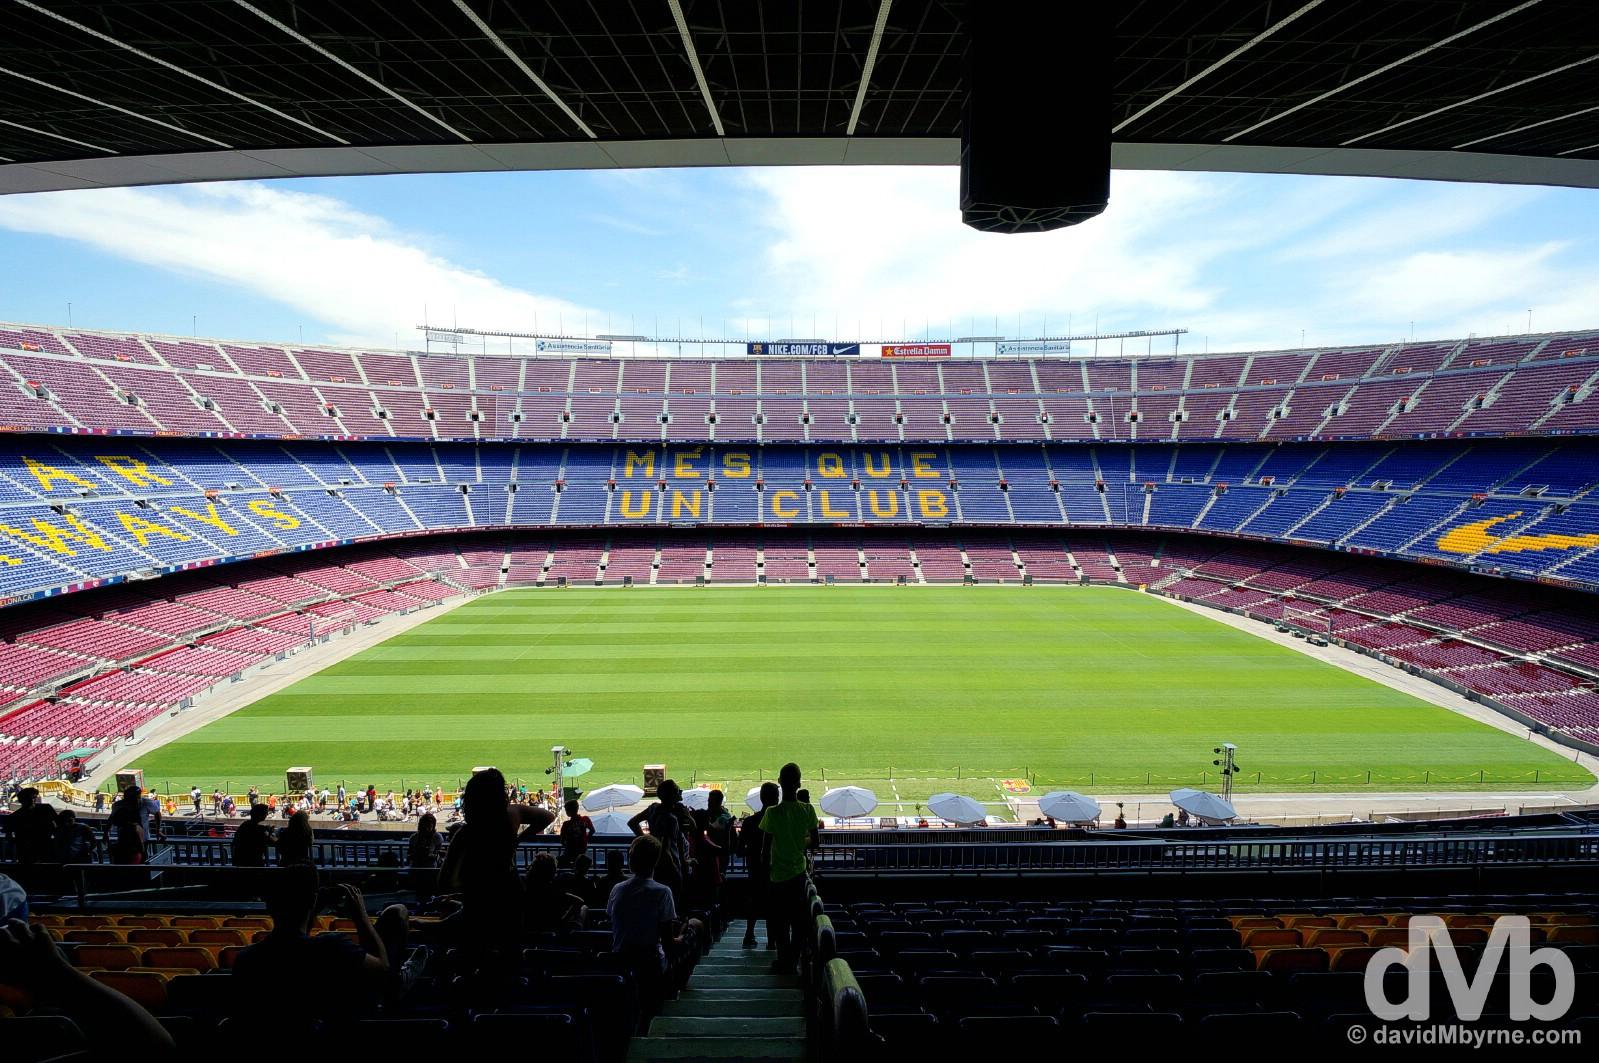 Camp Nou, Barcelona, Spain. June 18, 2014.